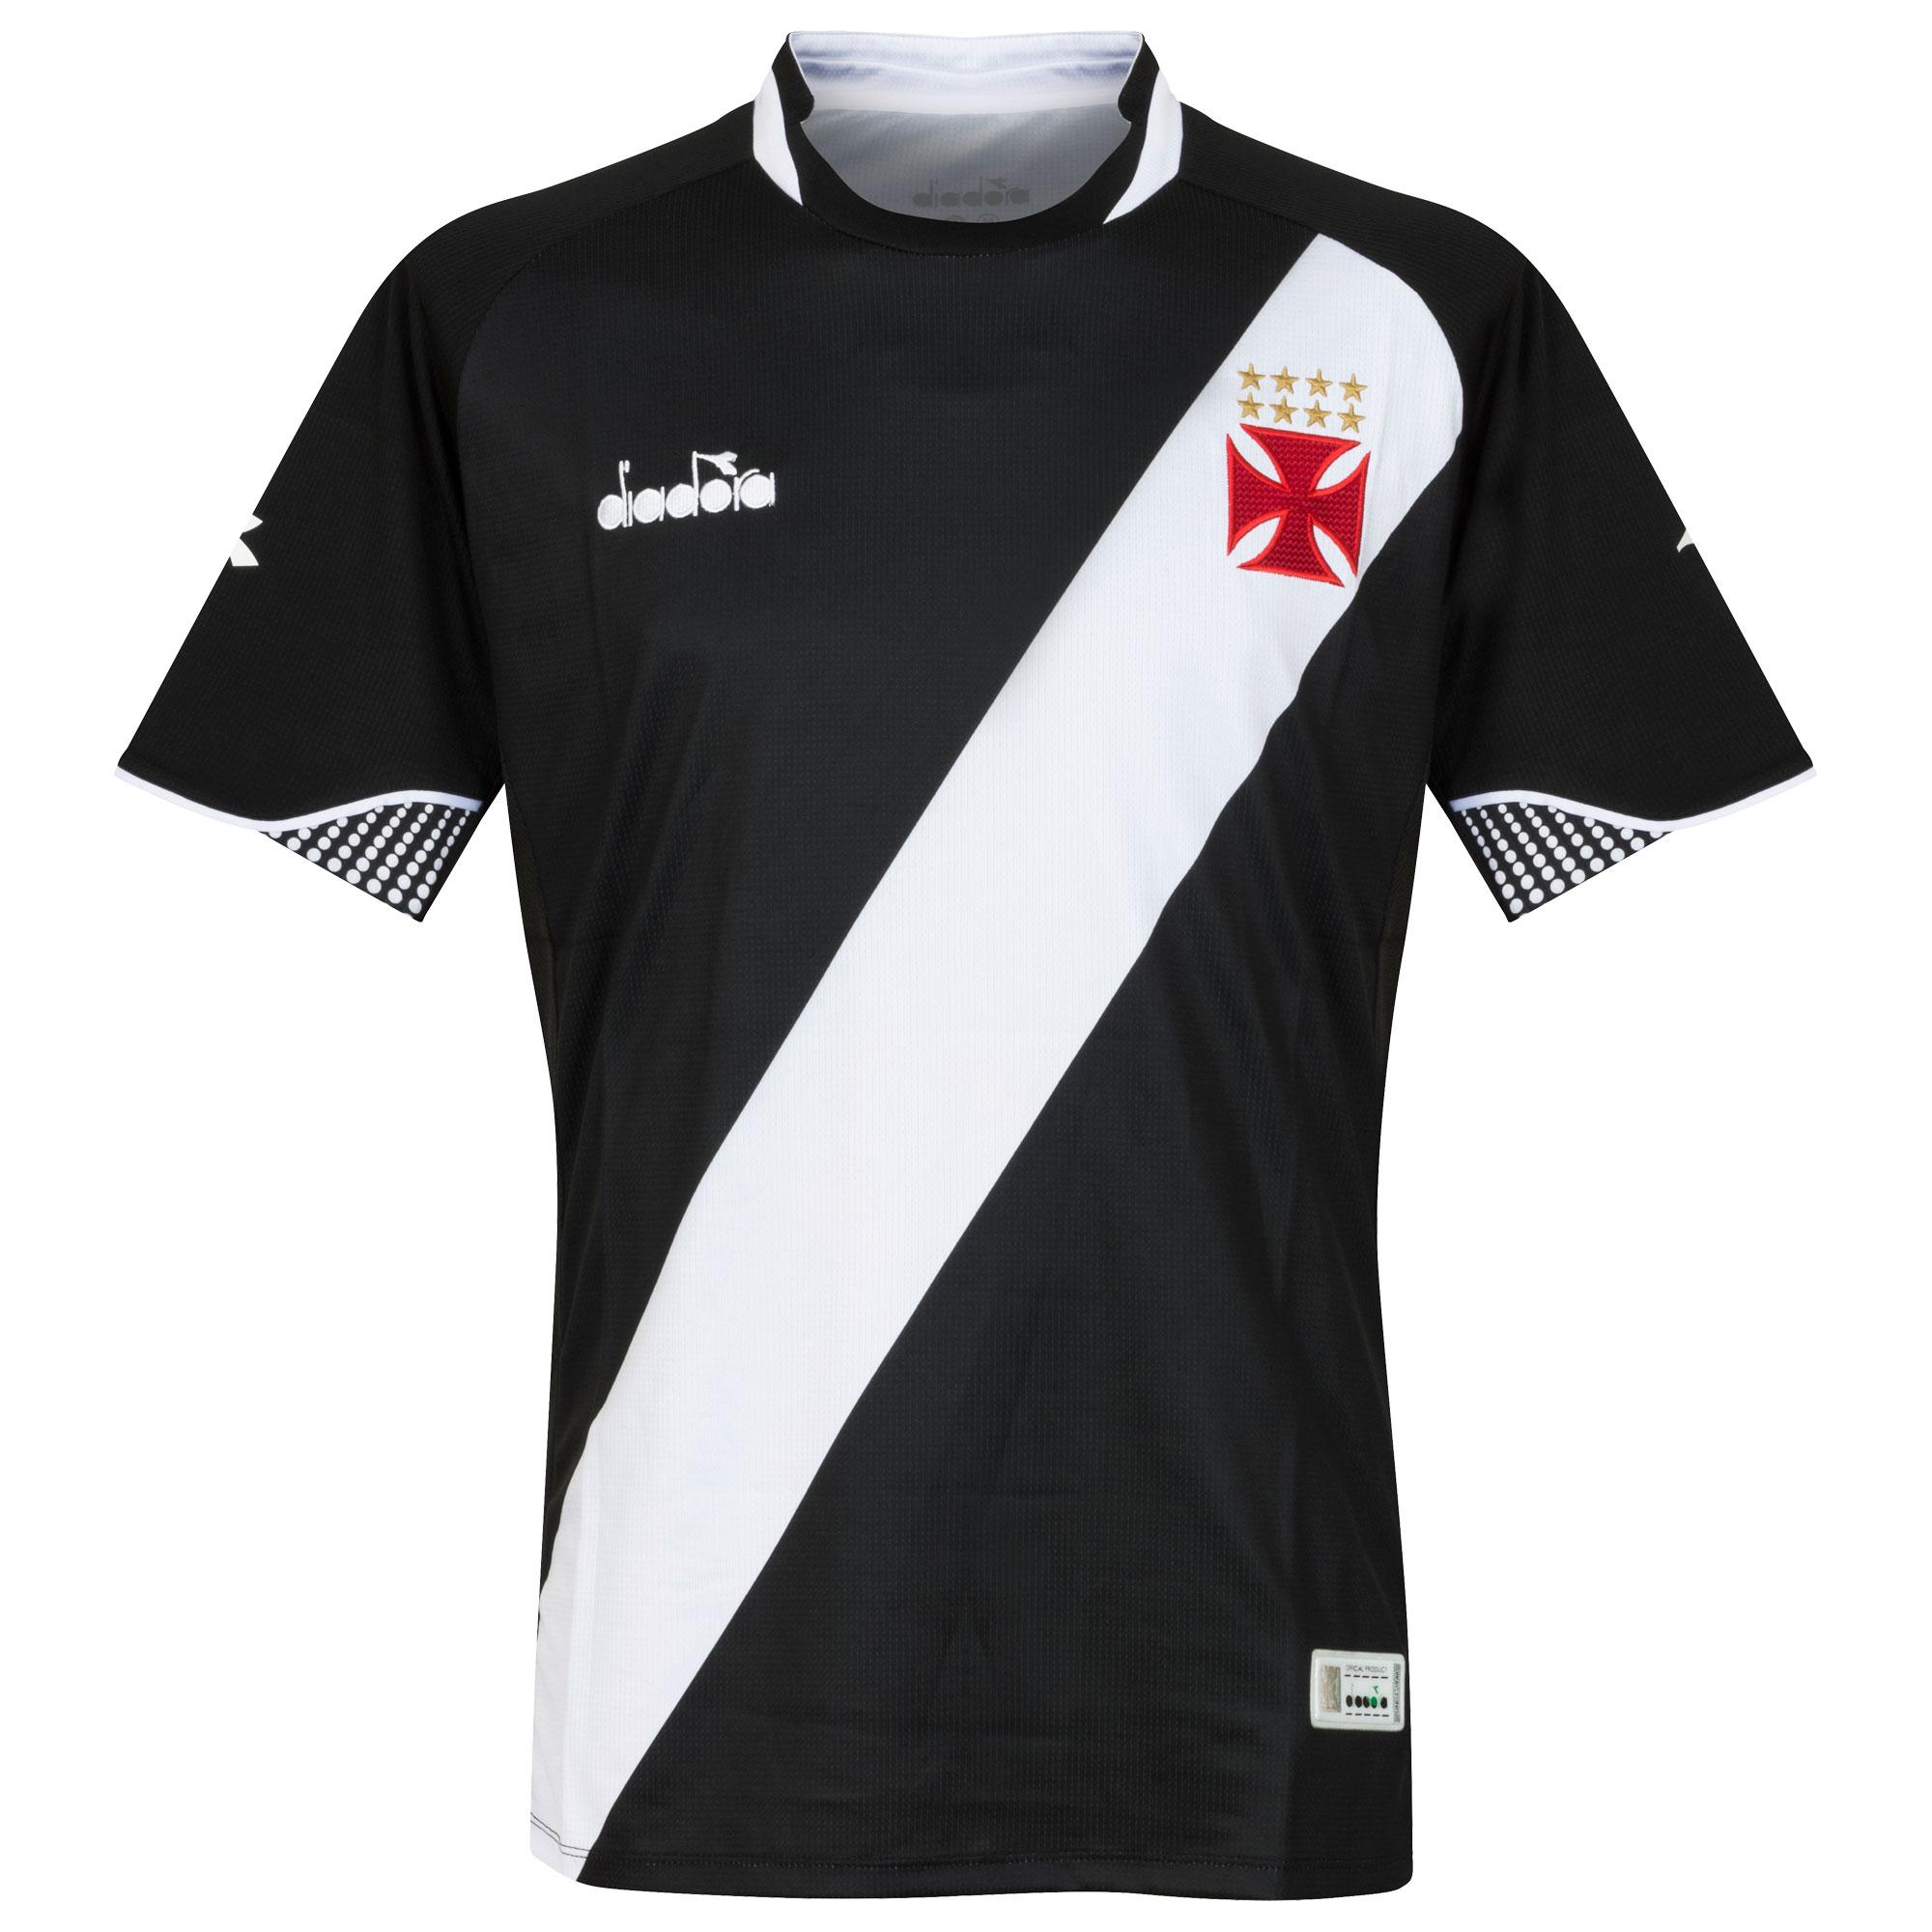 2018 Vasco Da Gama Home Shirt